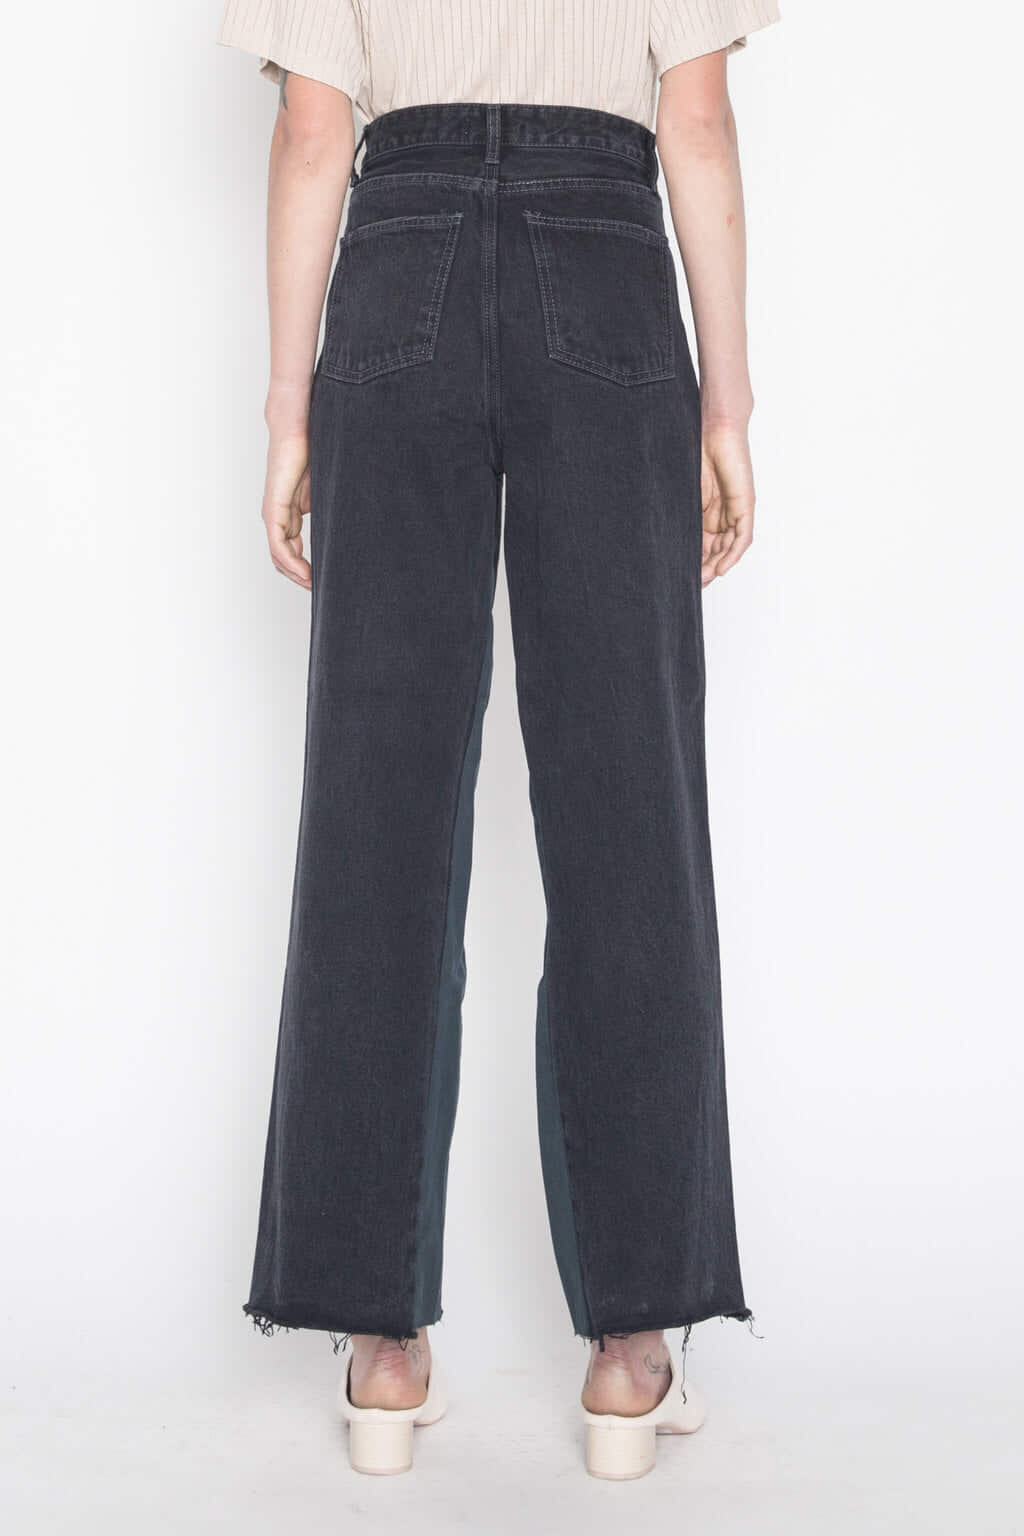 Dark Jean H011 Black 2